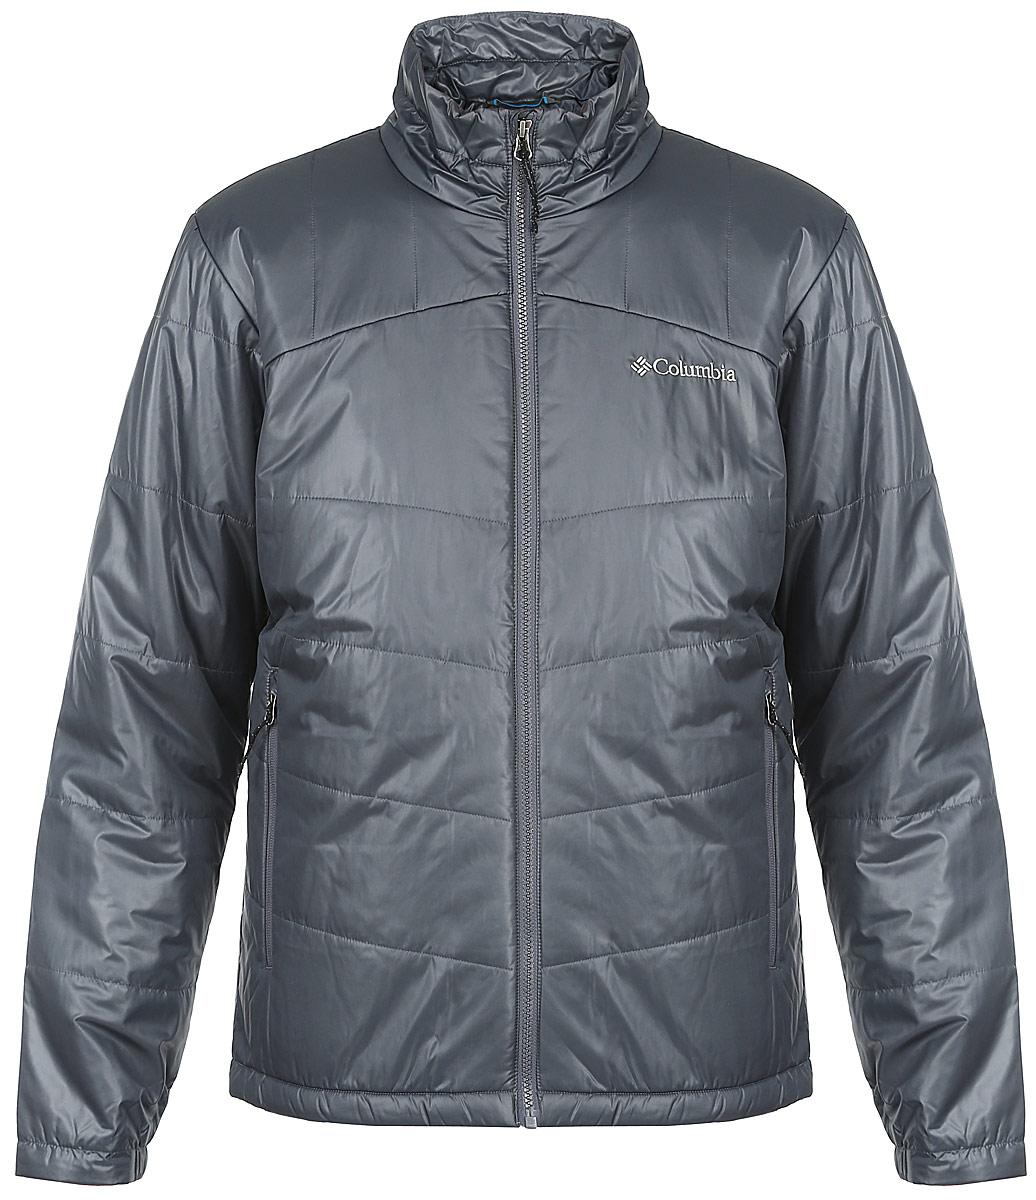 Columbia Куртка мужская Cutting Strokes Jacket. WM1024-053